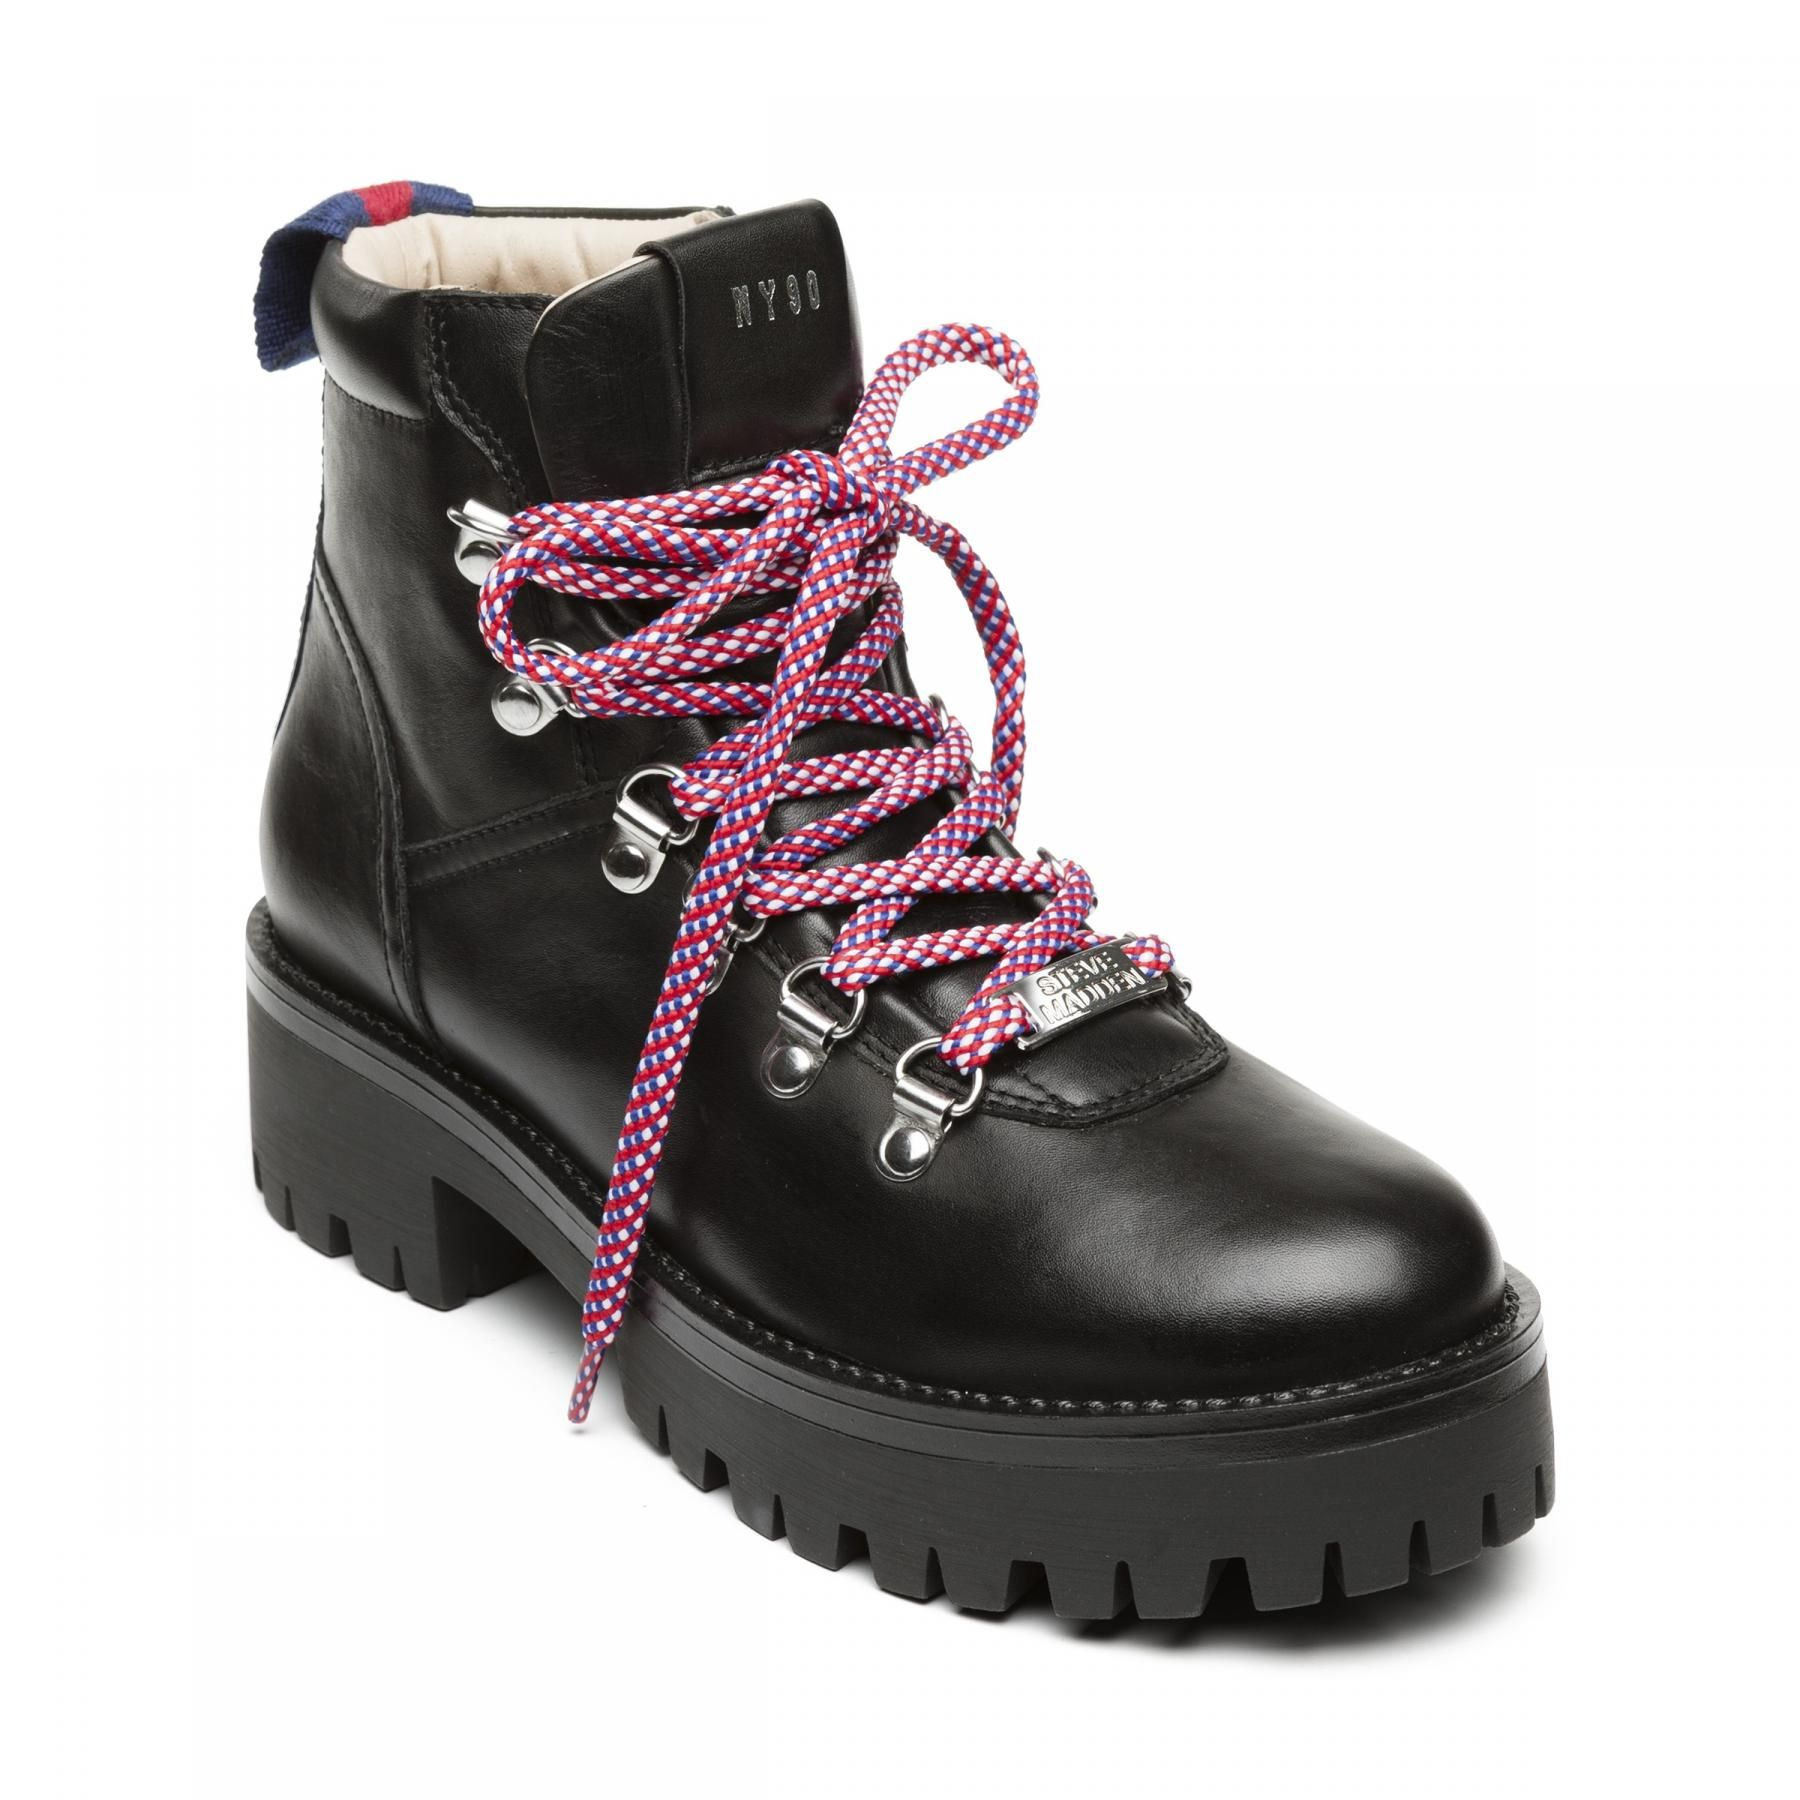 932e545ea66 Boomer Bottine Noir Cuir | Wishlist in 2019 | Black leather boots ...